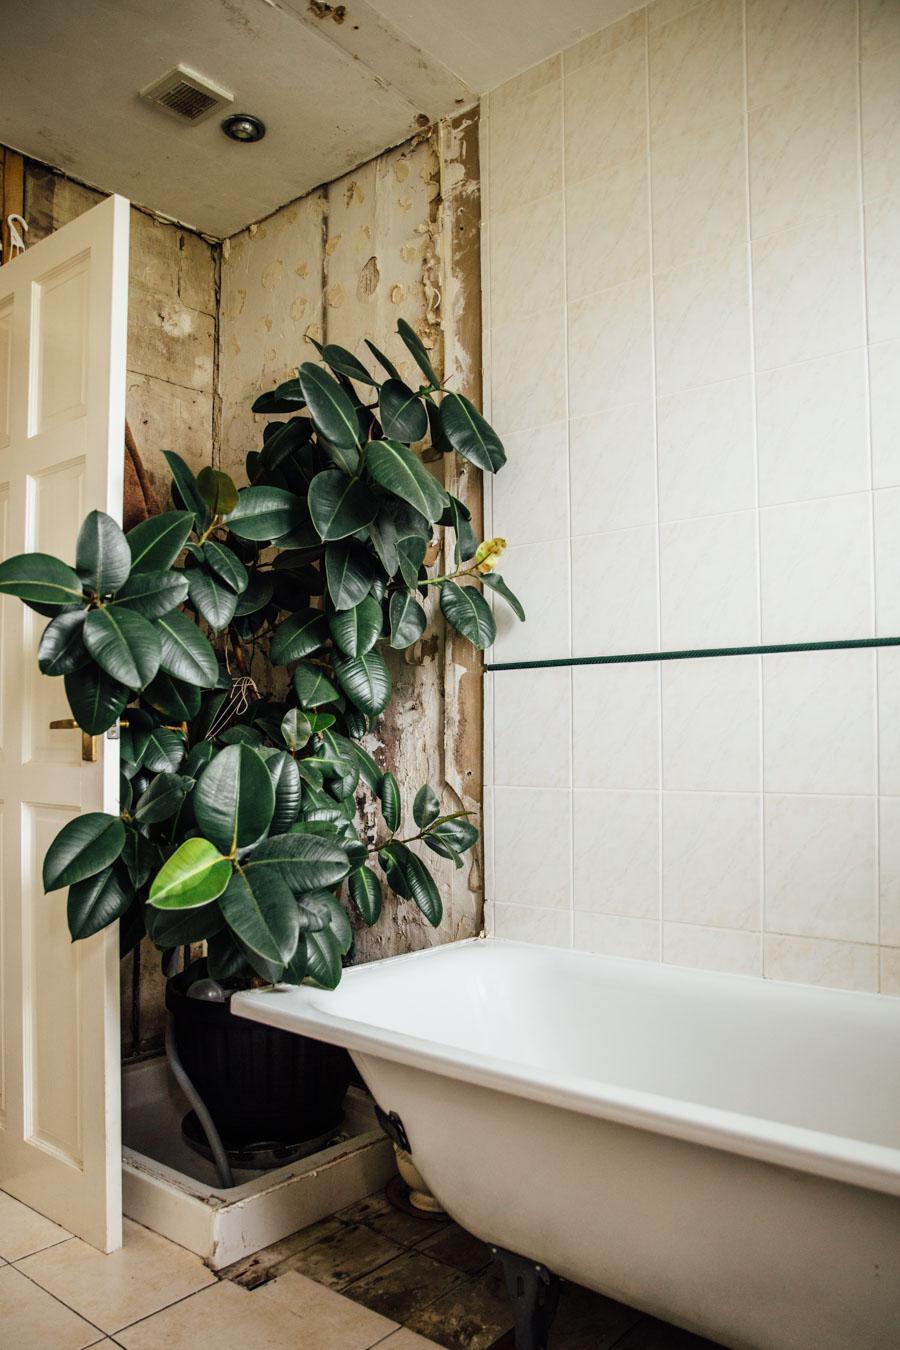 Rustic bathroom dated tiles